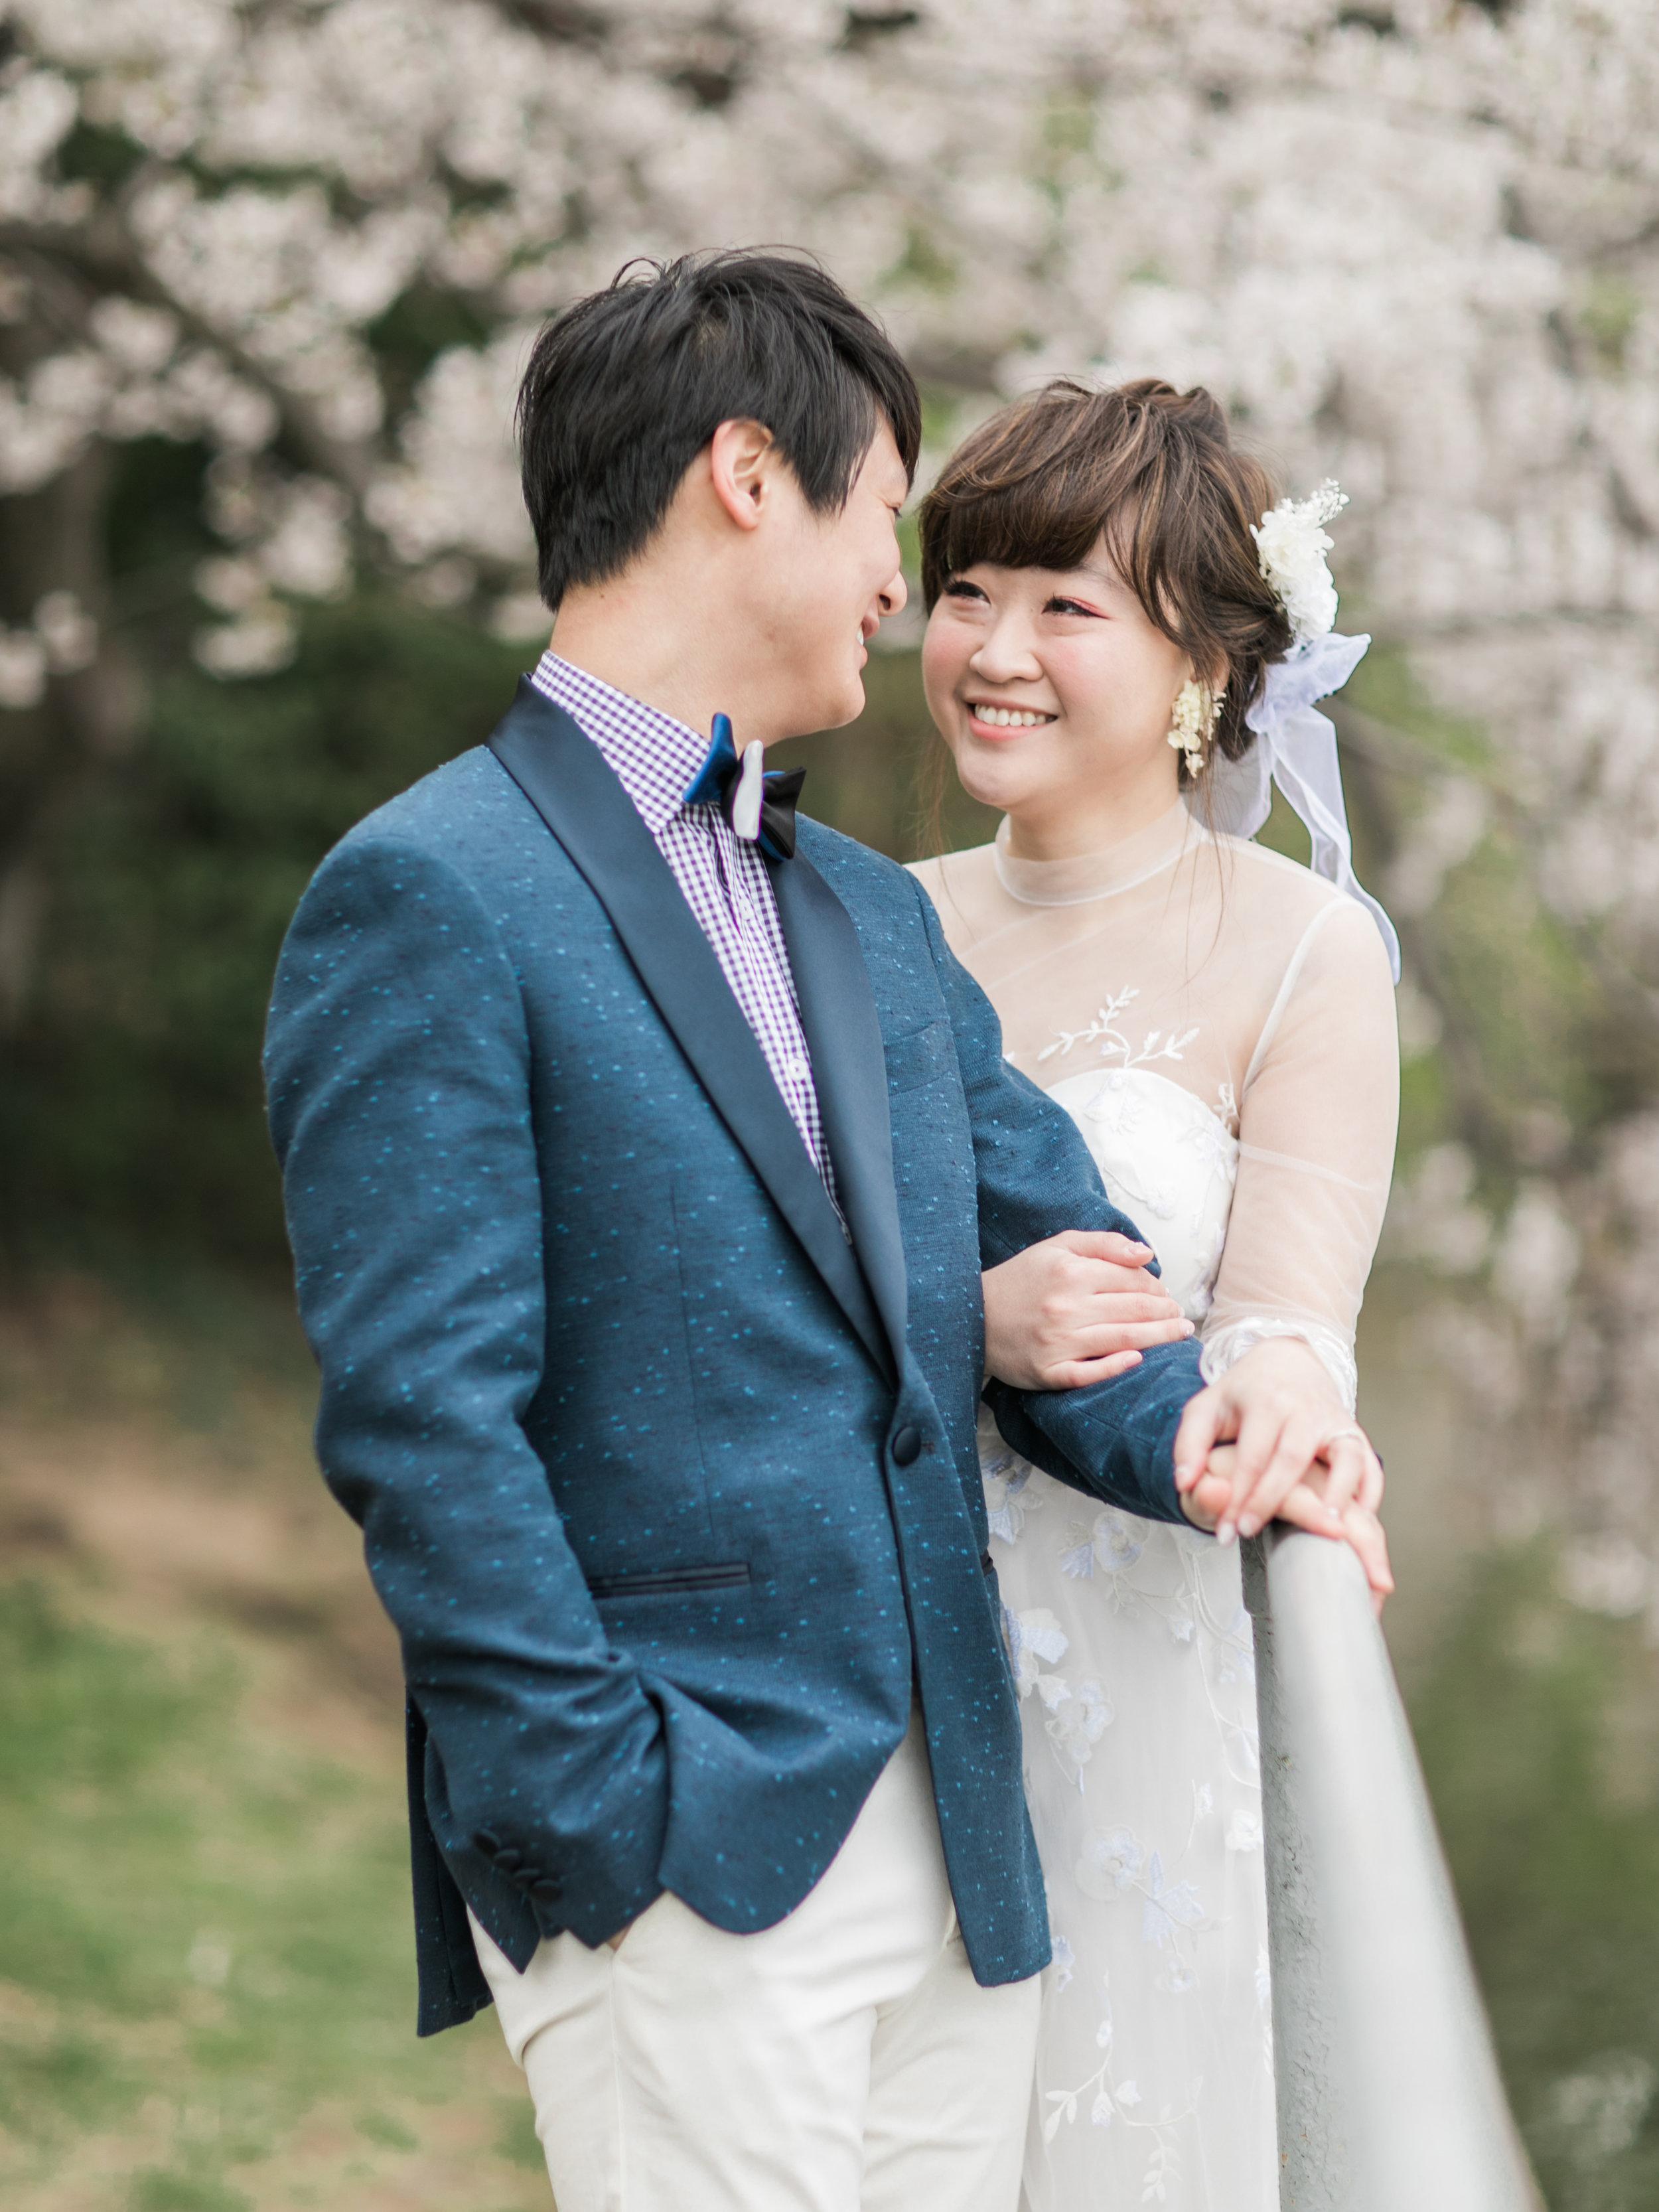 cherry-blossom-engagement-photos48.jpg